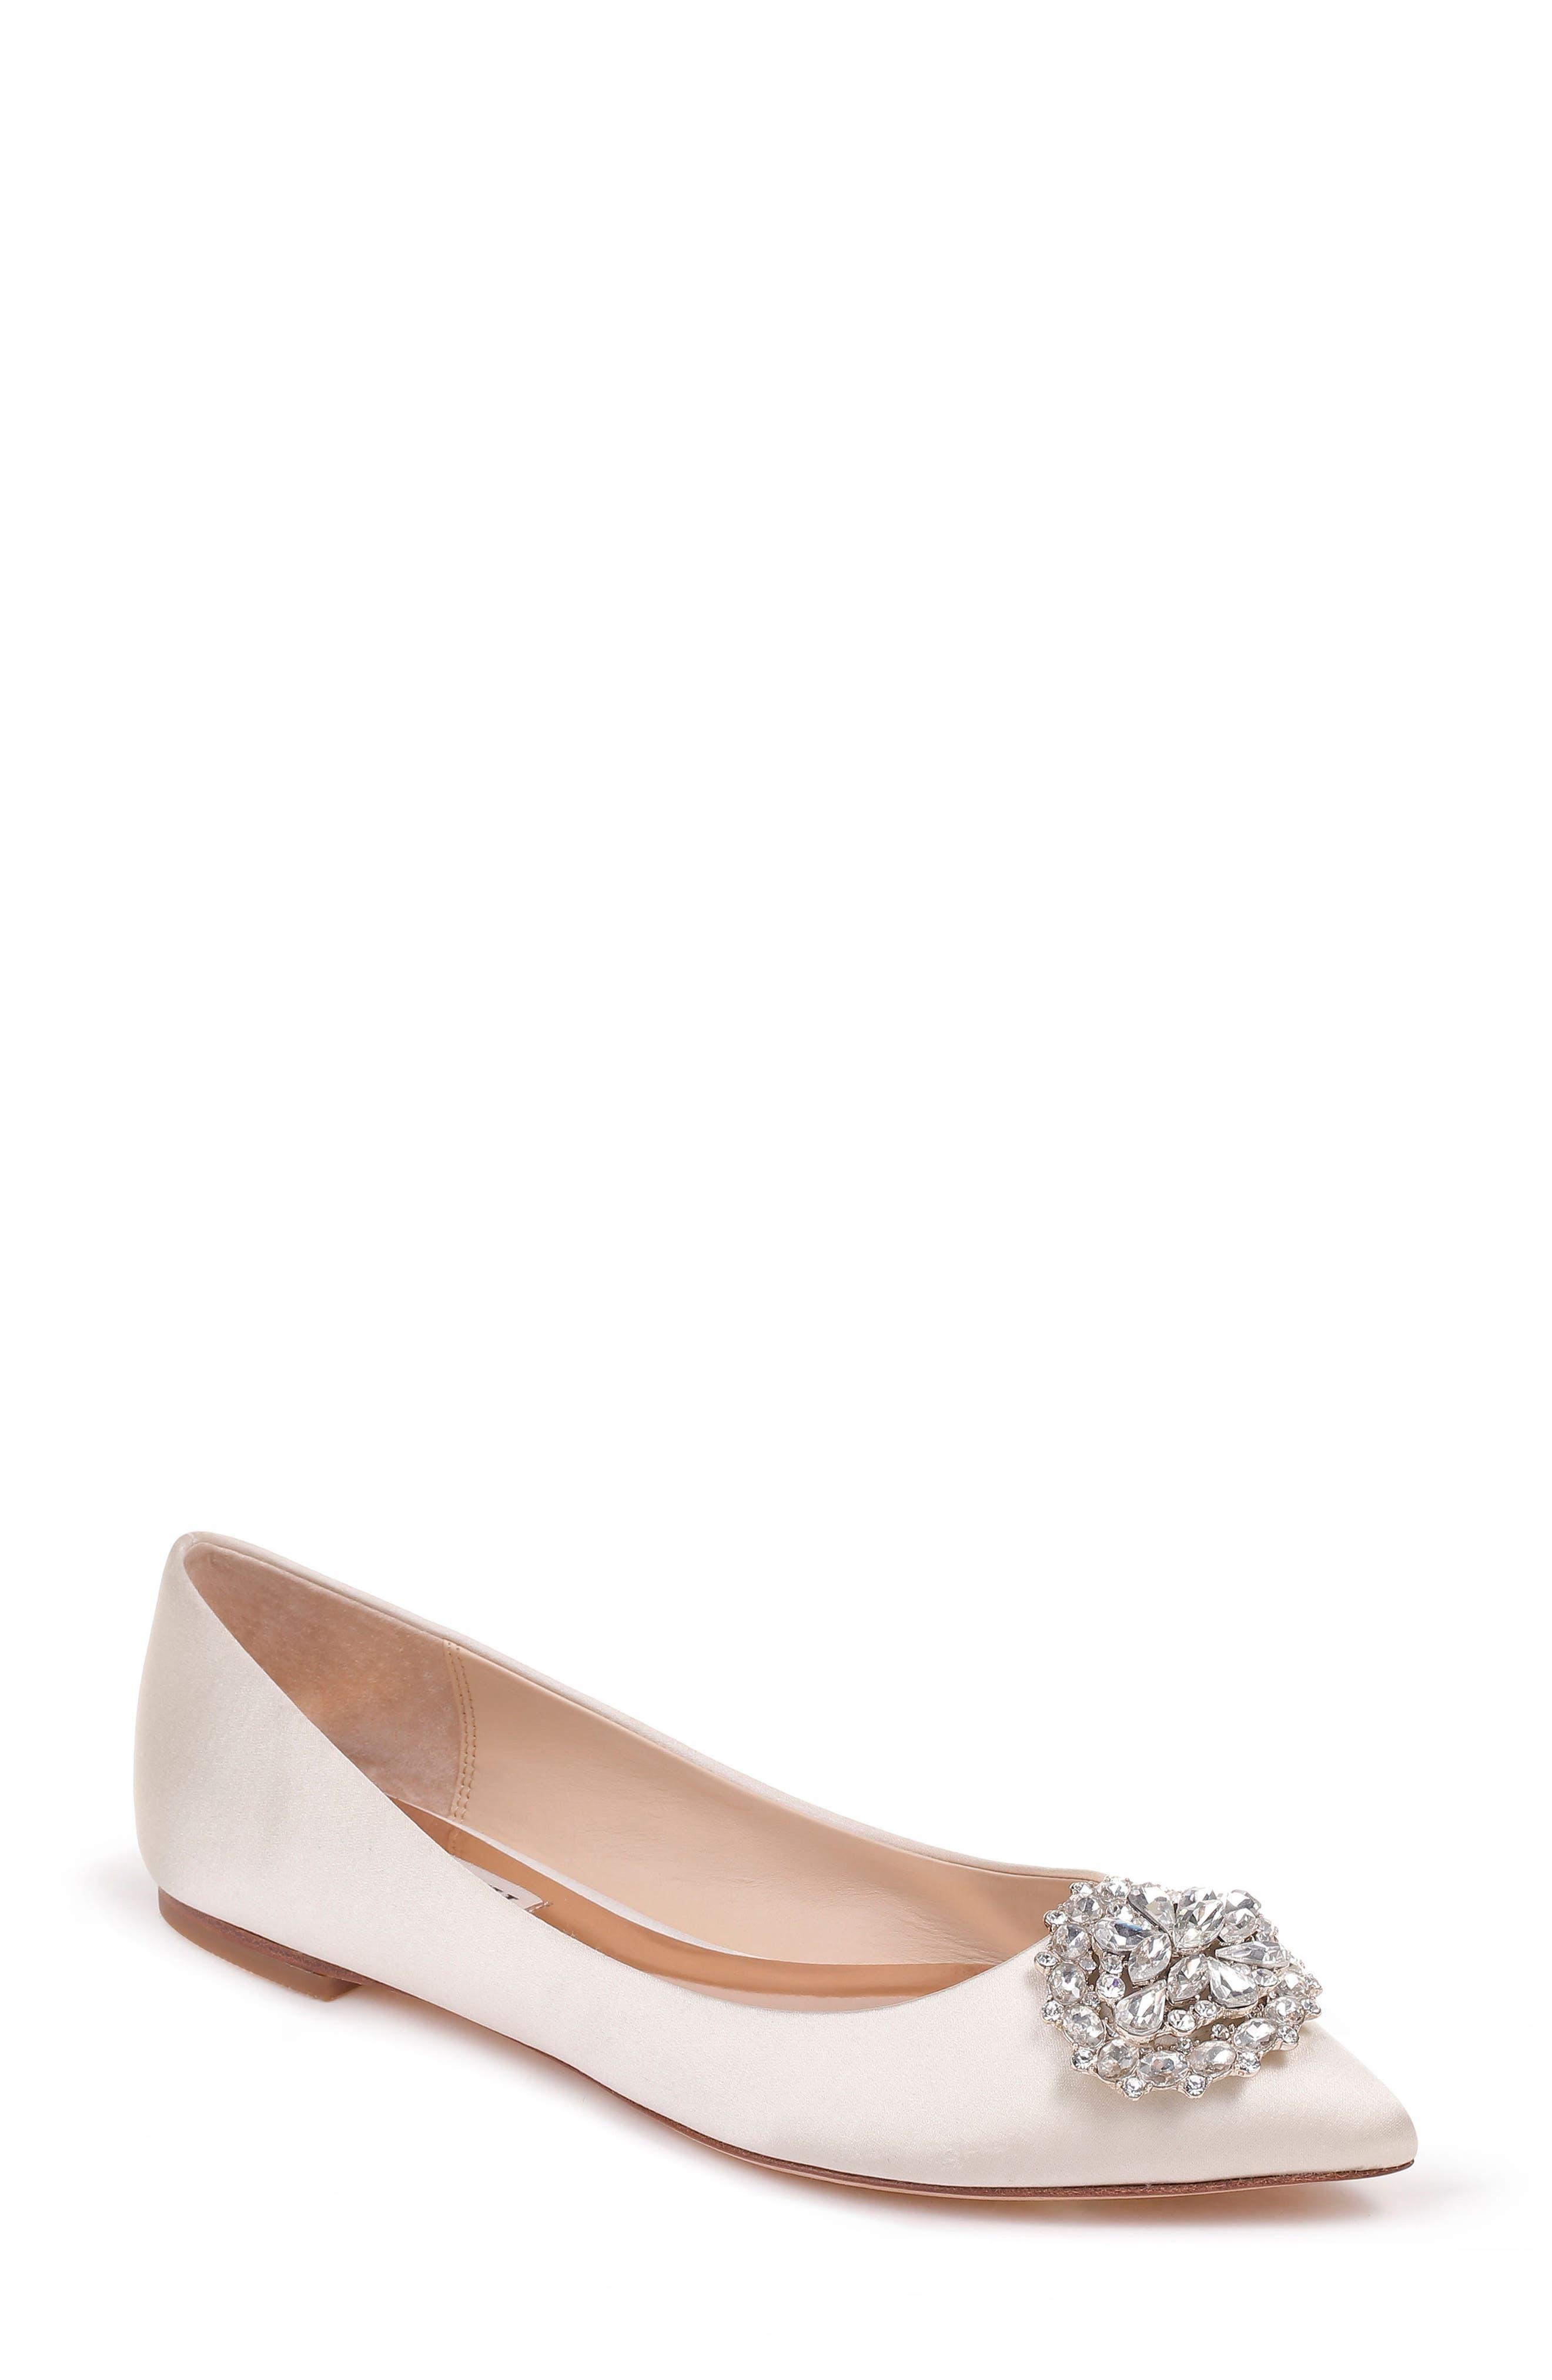 'Davis' Crystal Embellished Pointy Toe Flat,                             Main thumbnail 1, color,                             Ivory Satin